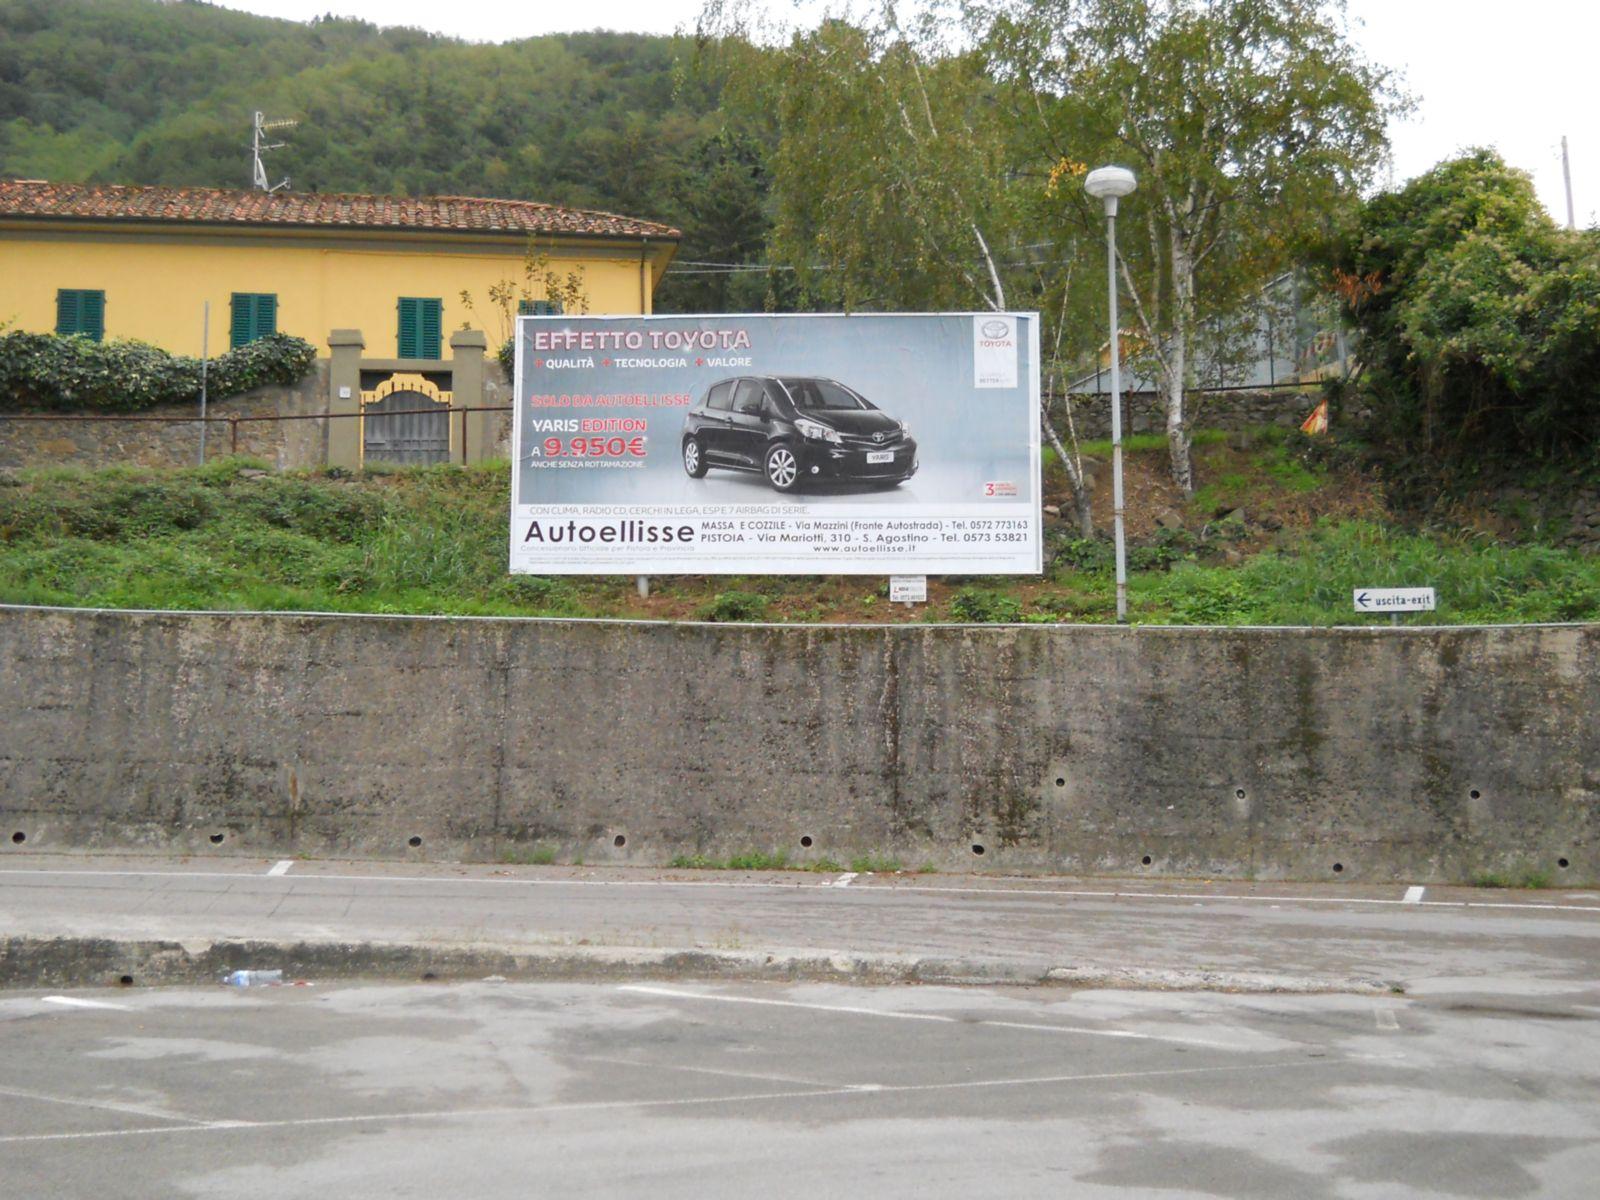 http://www.postermap.it/wp-content/uploads/2015/09/autoellisse-toyota.jpg